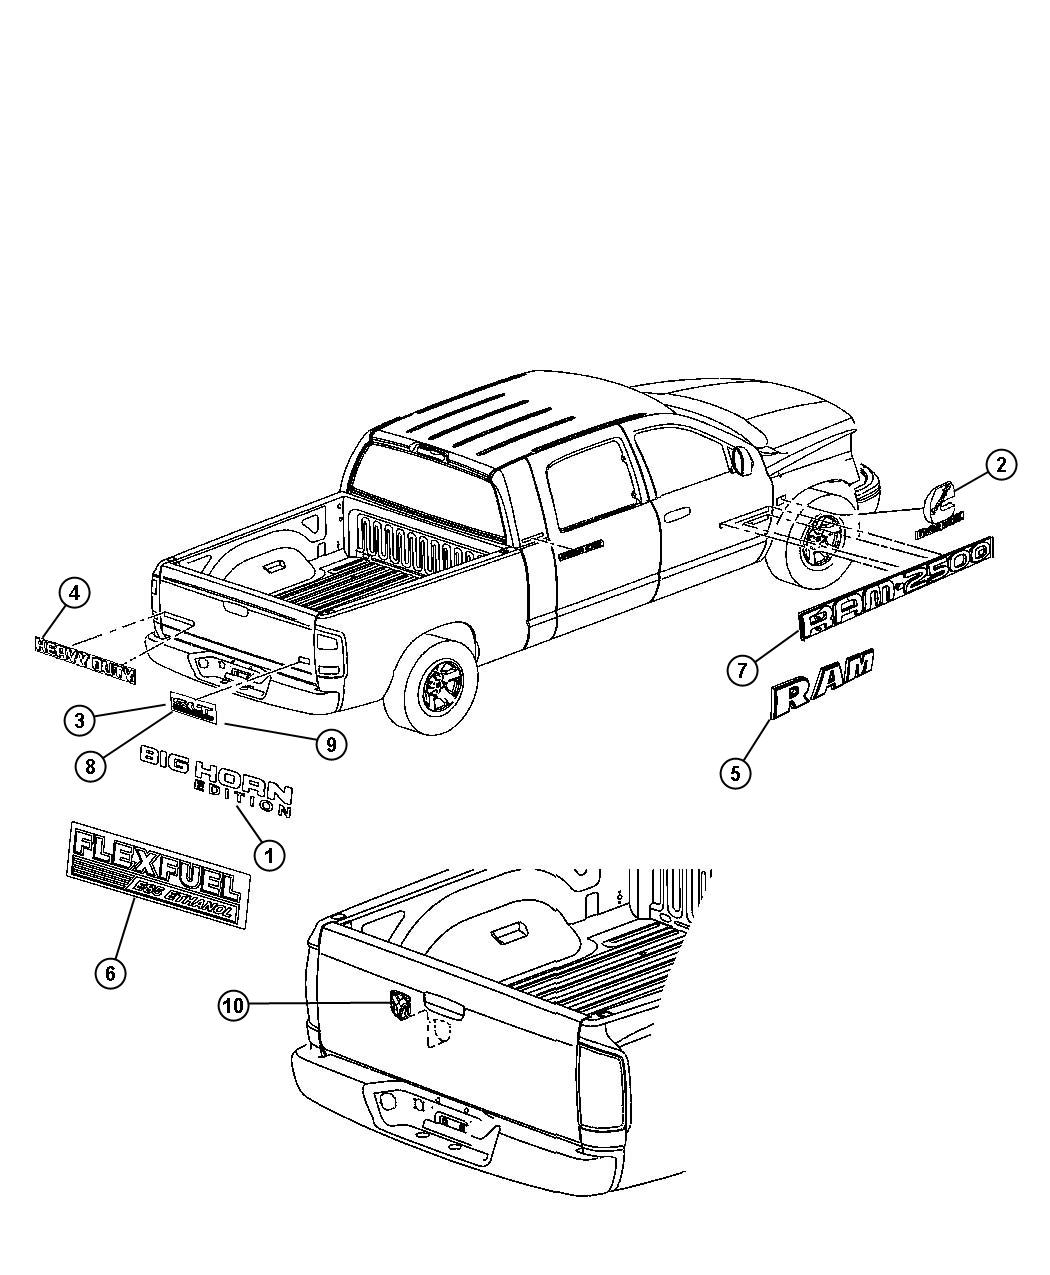 Dodge Ram 1500 Nameplate  Tailgate  Big Horn  Lower Right